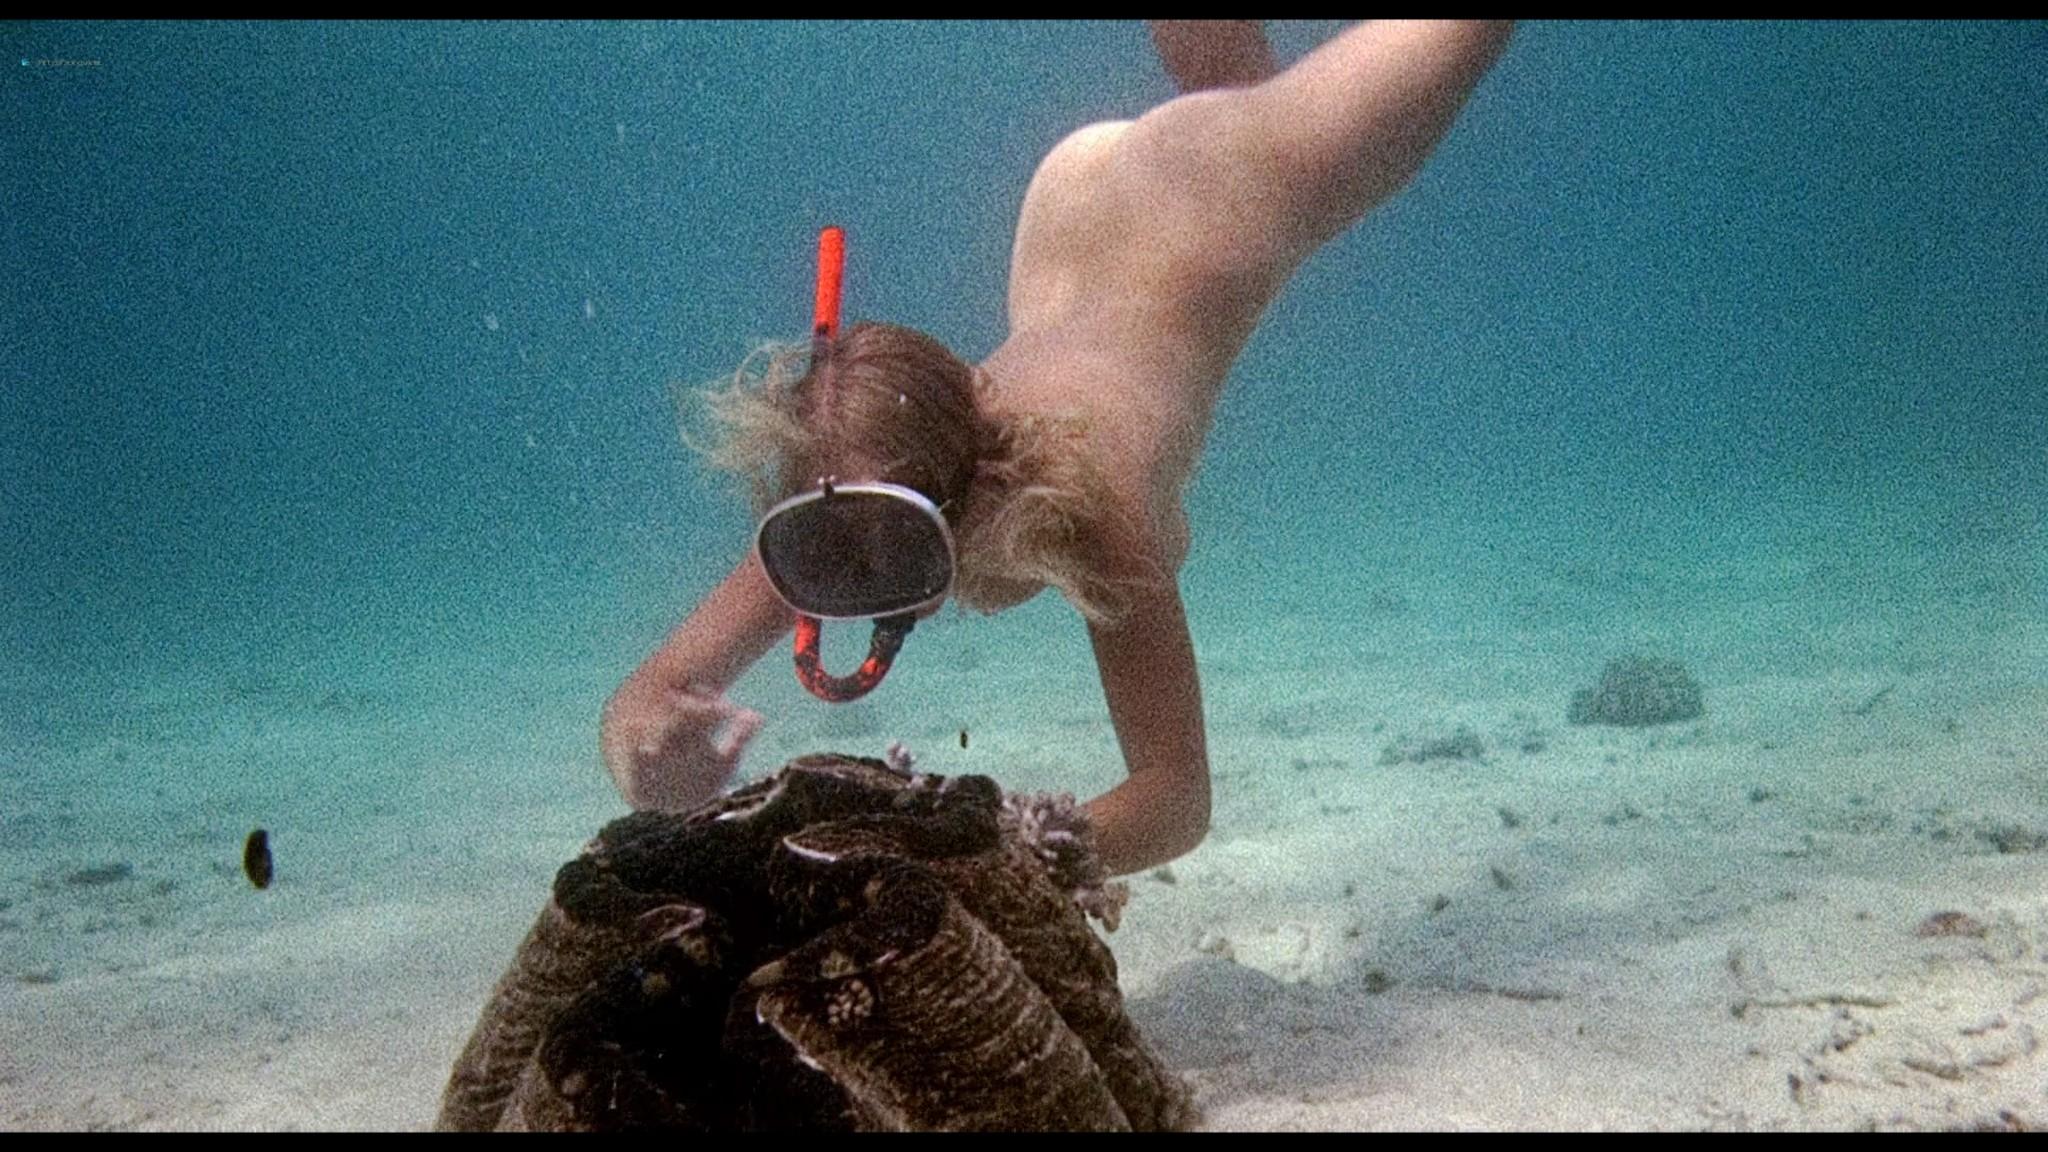 Helen Mirren nude skinny dipping Clarissa Kaye-Mason nude sex - Age of Consent (1969) HD 1080p BluRay Remux (13)